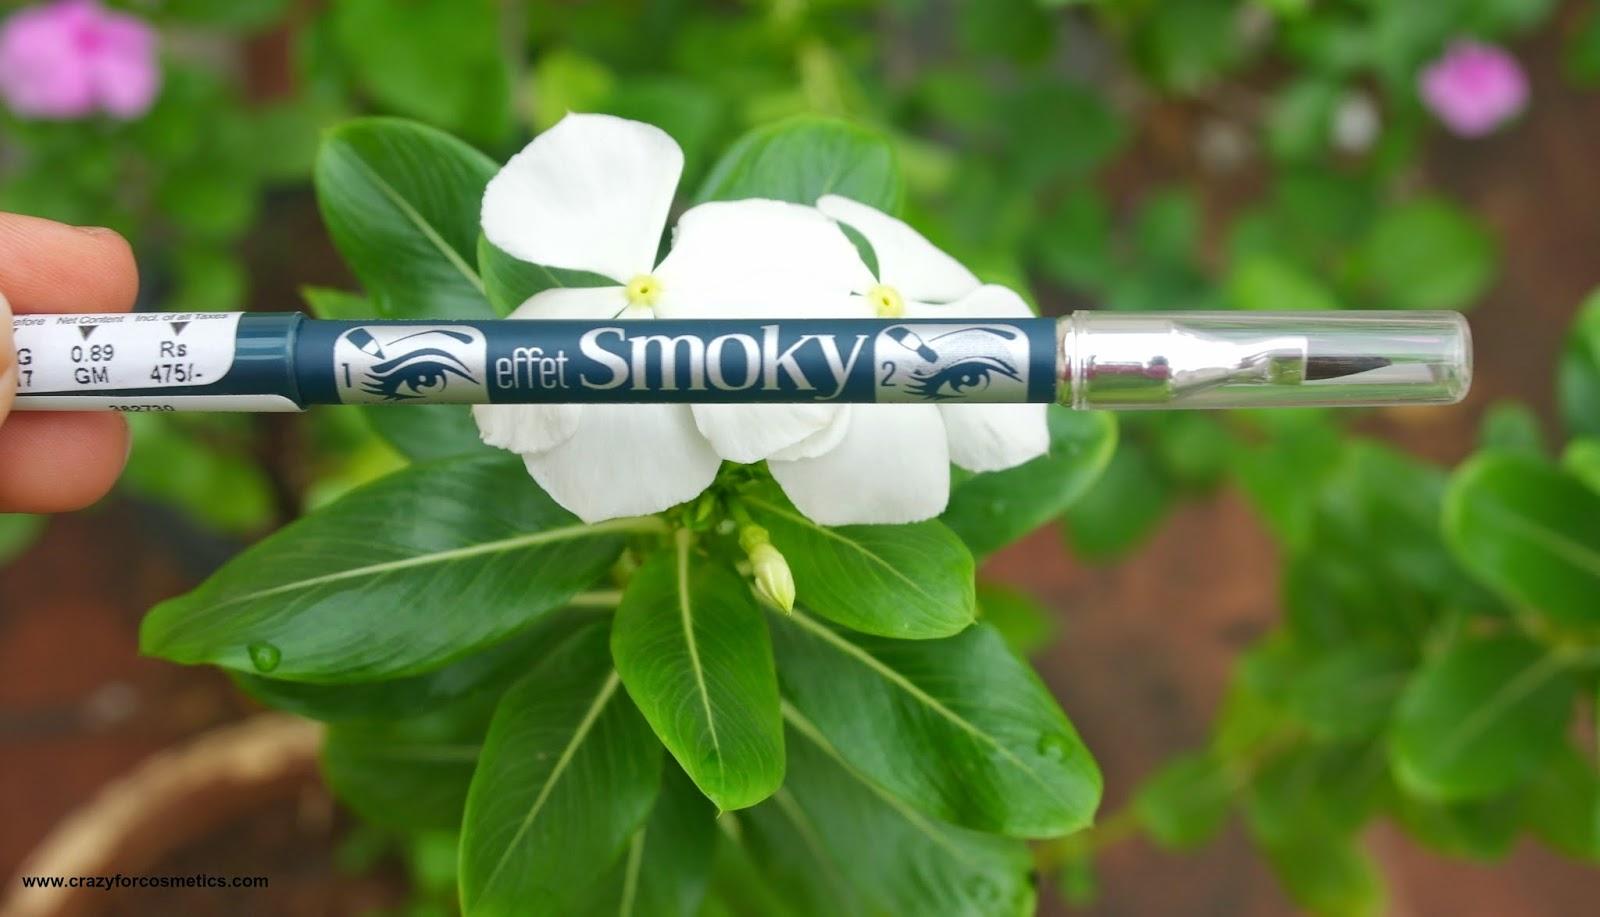 Bourjois Smoky Effect Eyeliner 73 Deep green swatch